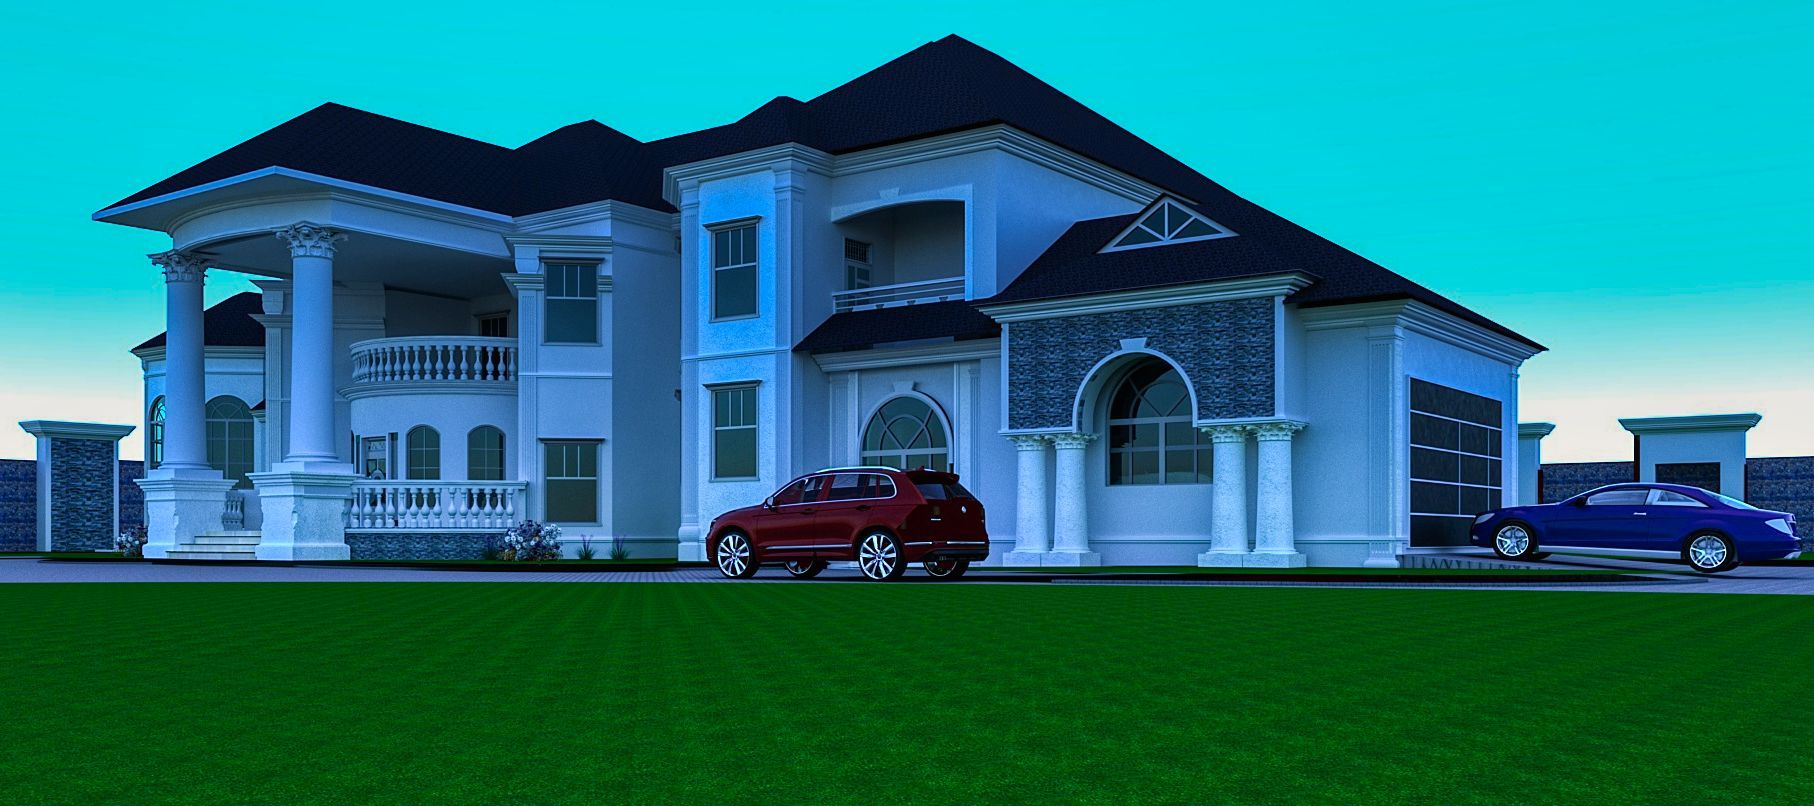 6 Bedroom House House Styles 6 Bedroom House Planner Design